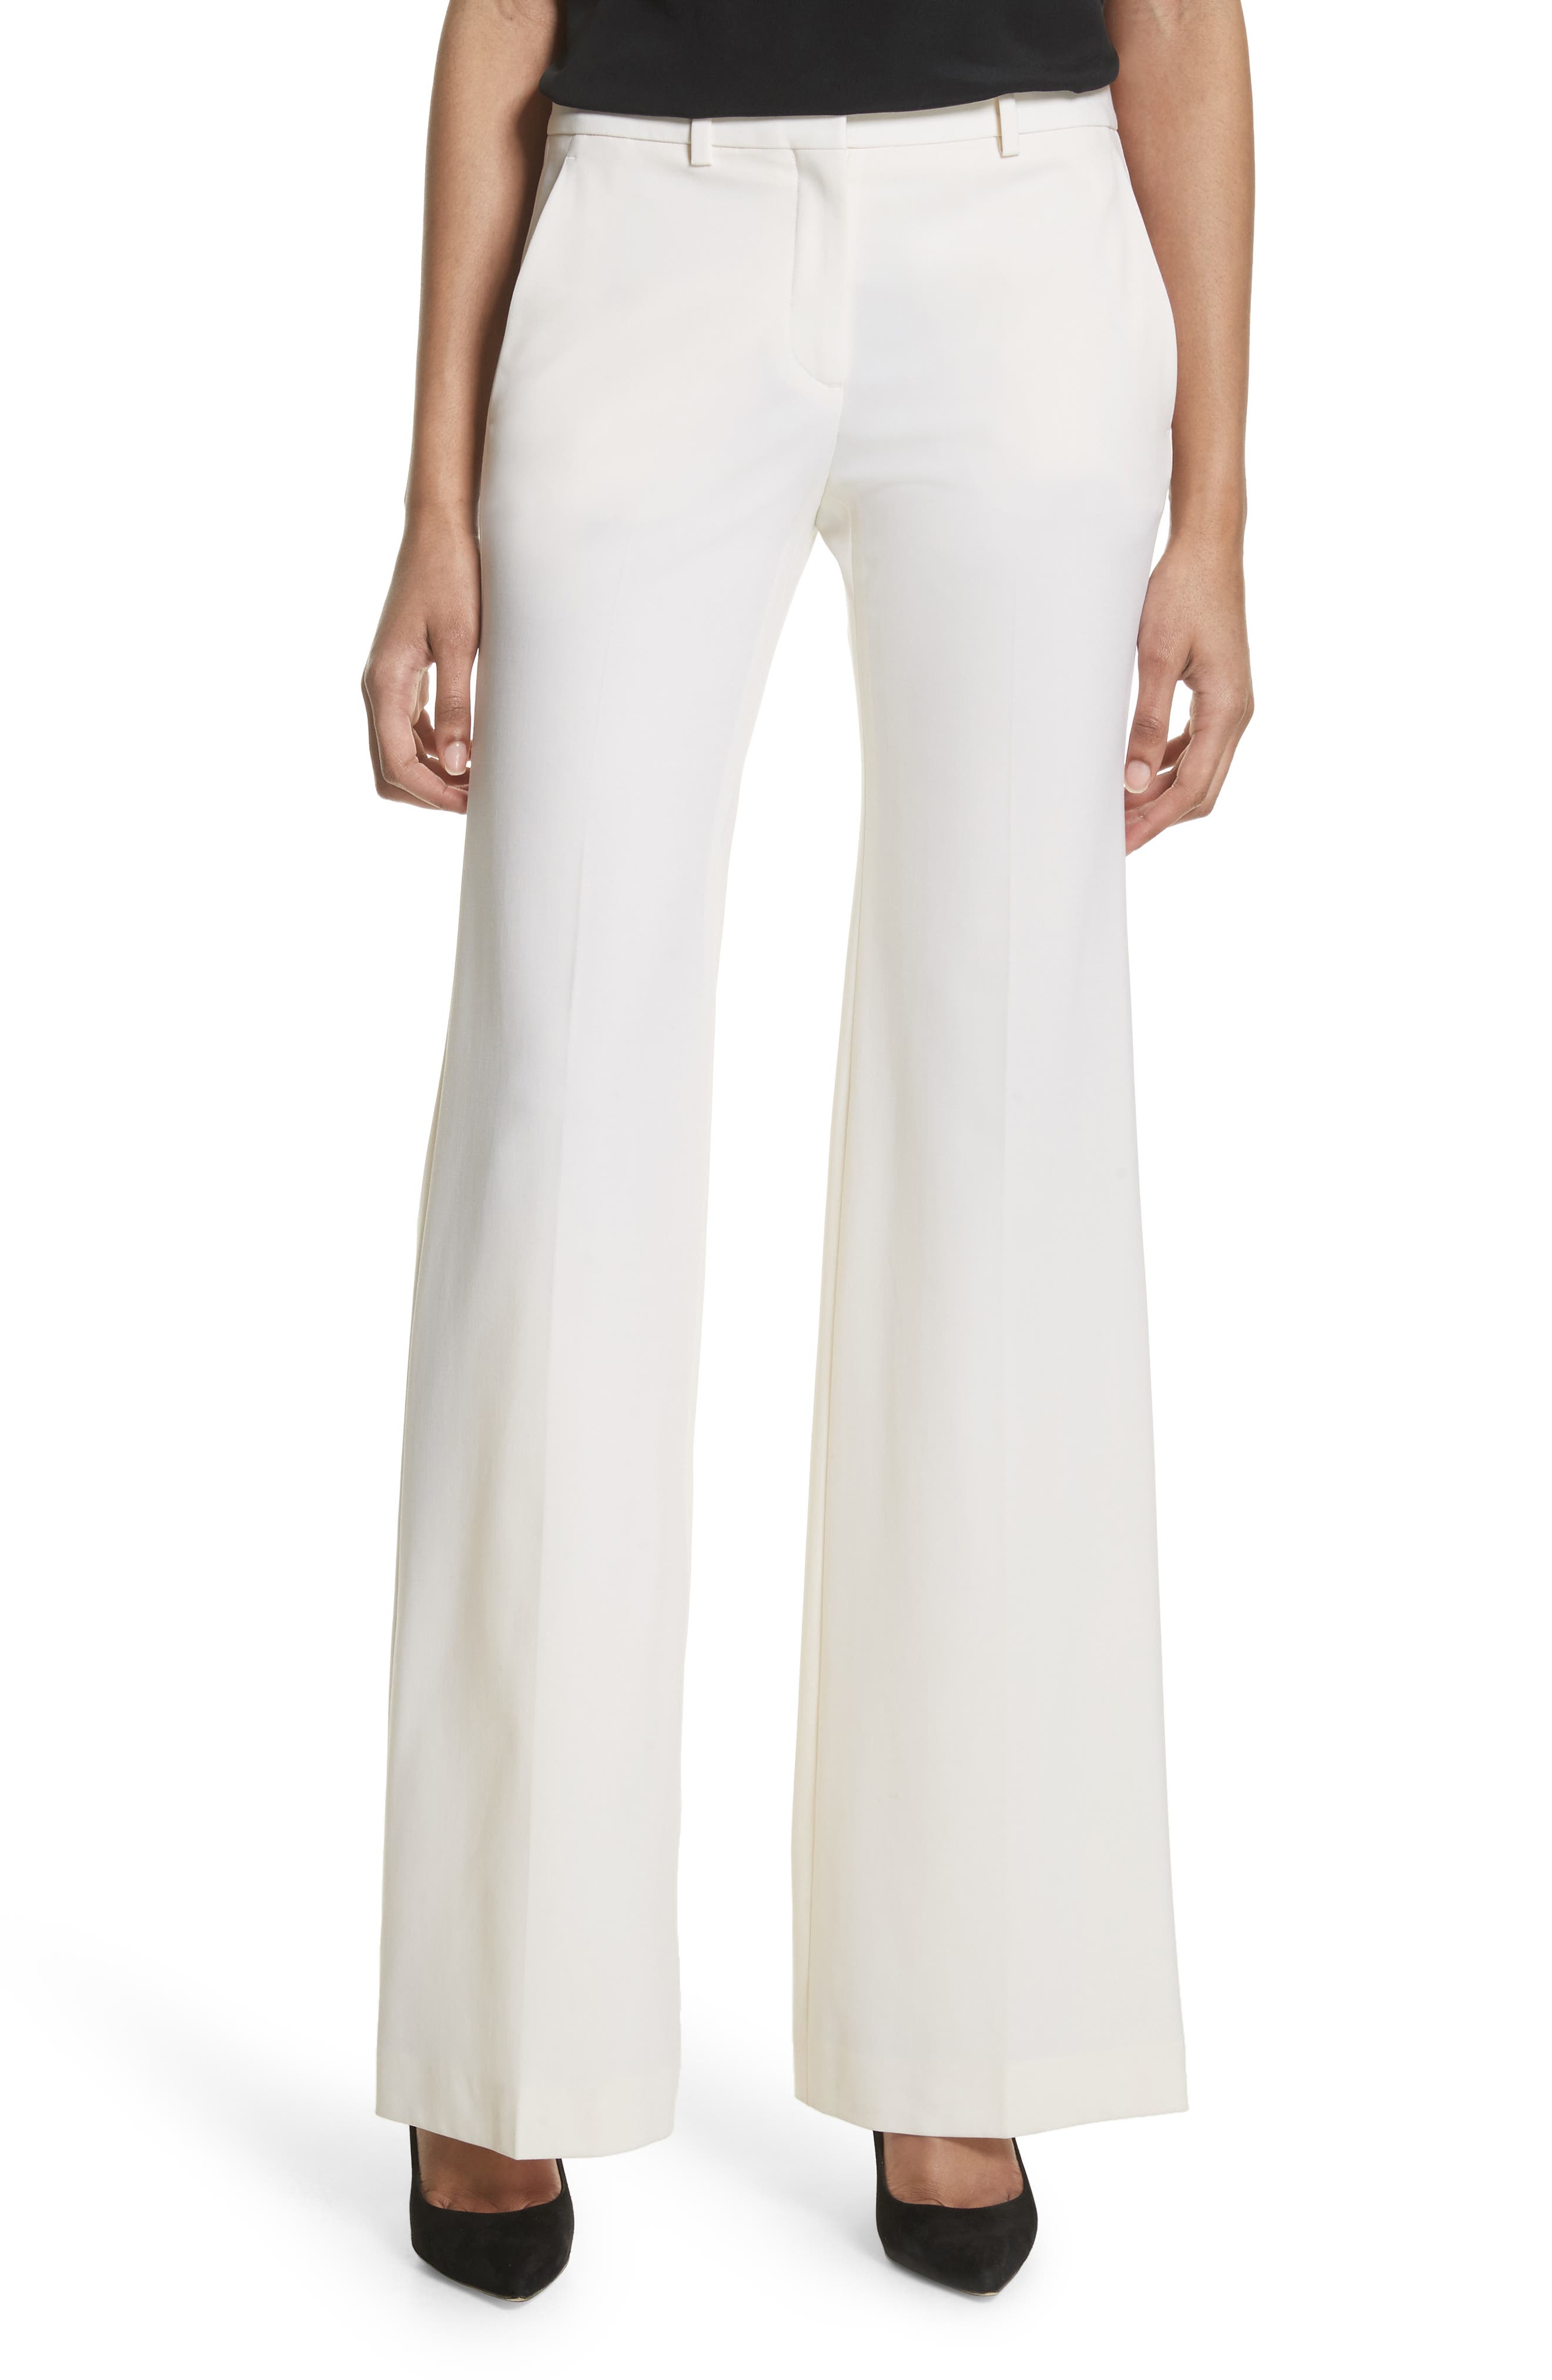 Demitria Polished Wool Pants,                             Main thumbnail 1, color,                             White